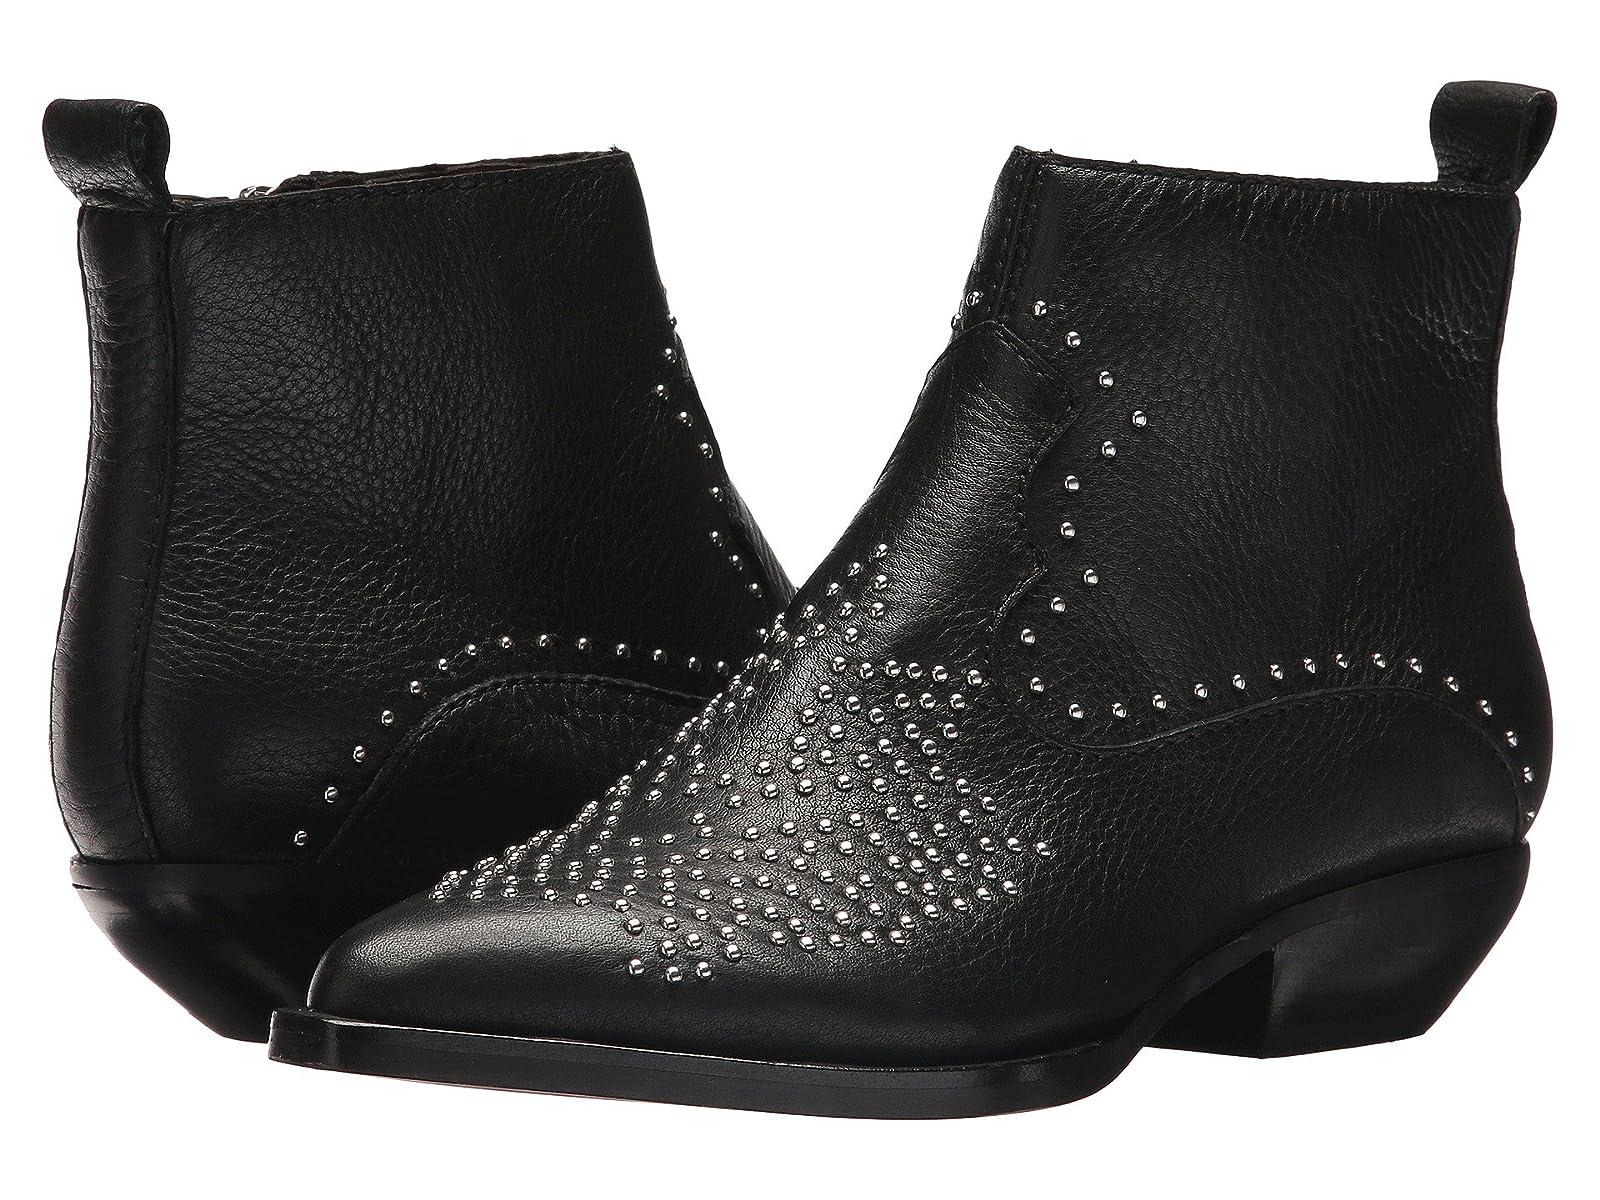 Dolce Vita UmaAffordable and distinctive shoes